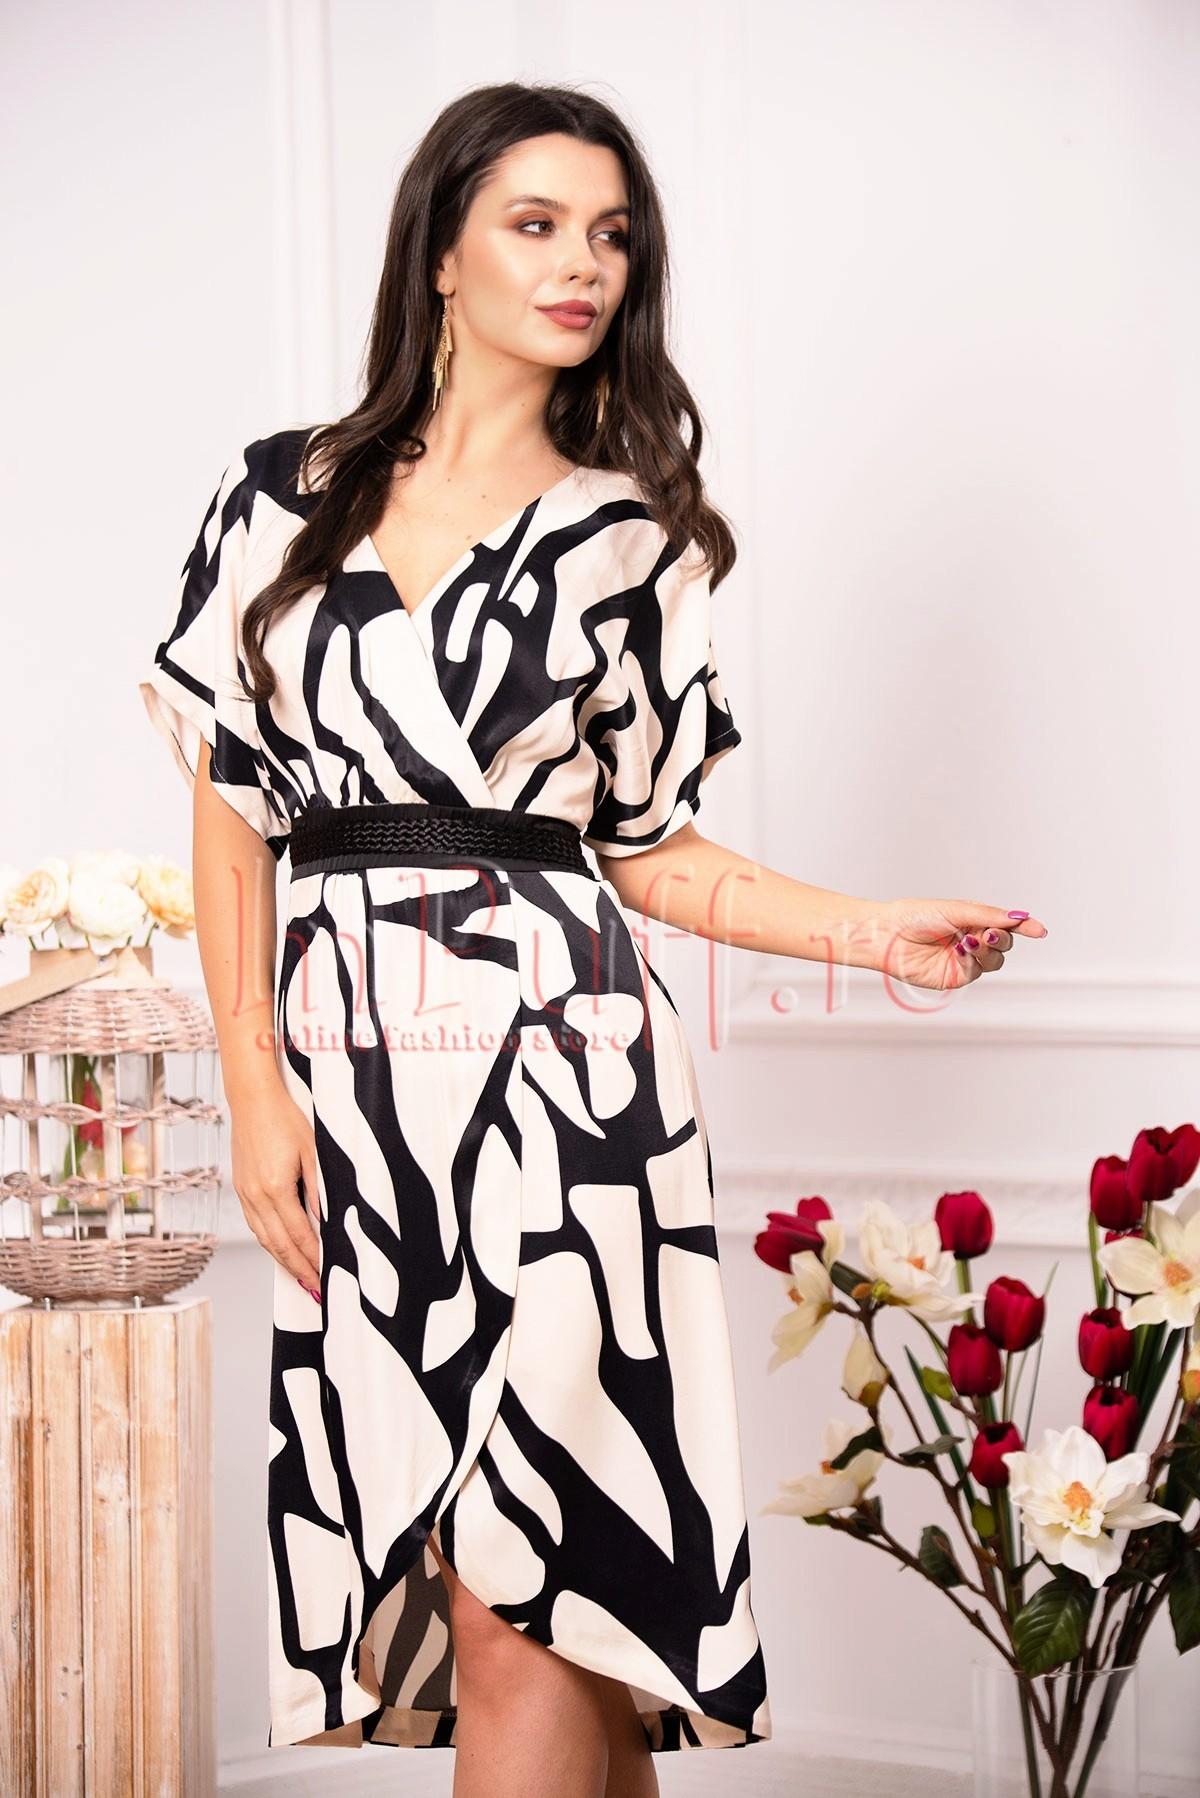 Rochie eleganta de vara cu imprimeu tip zebra